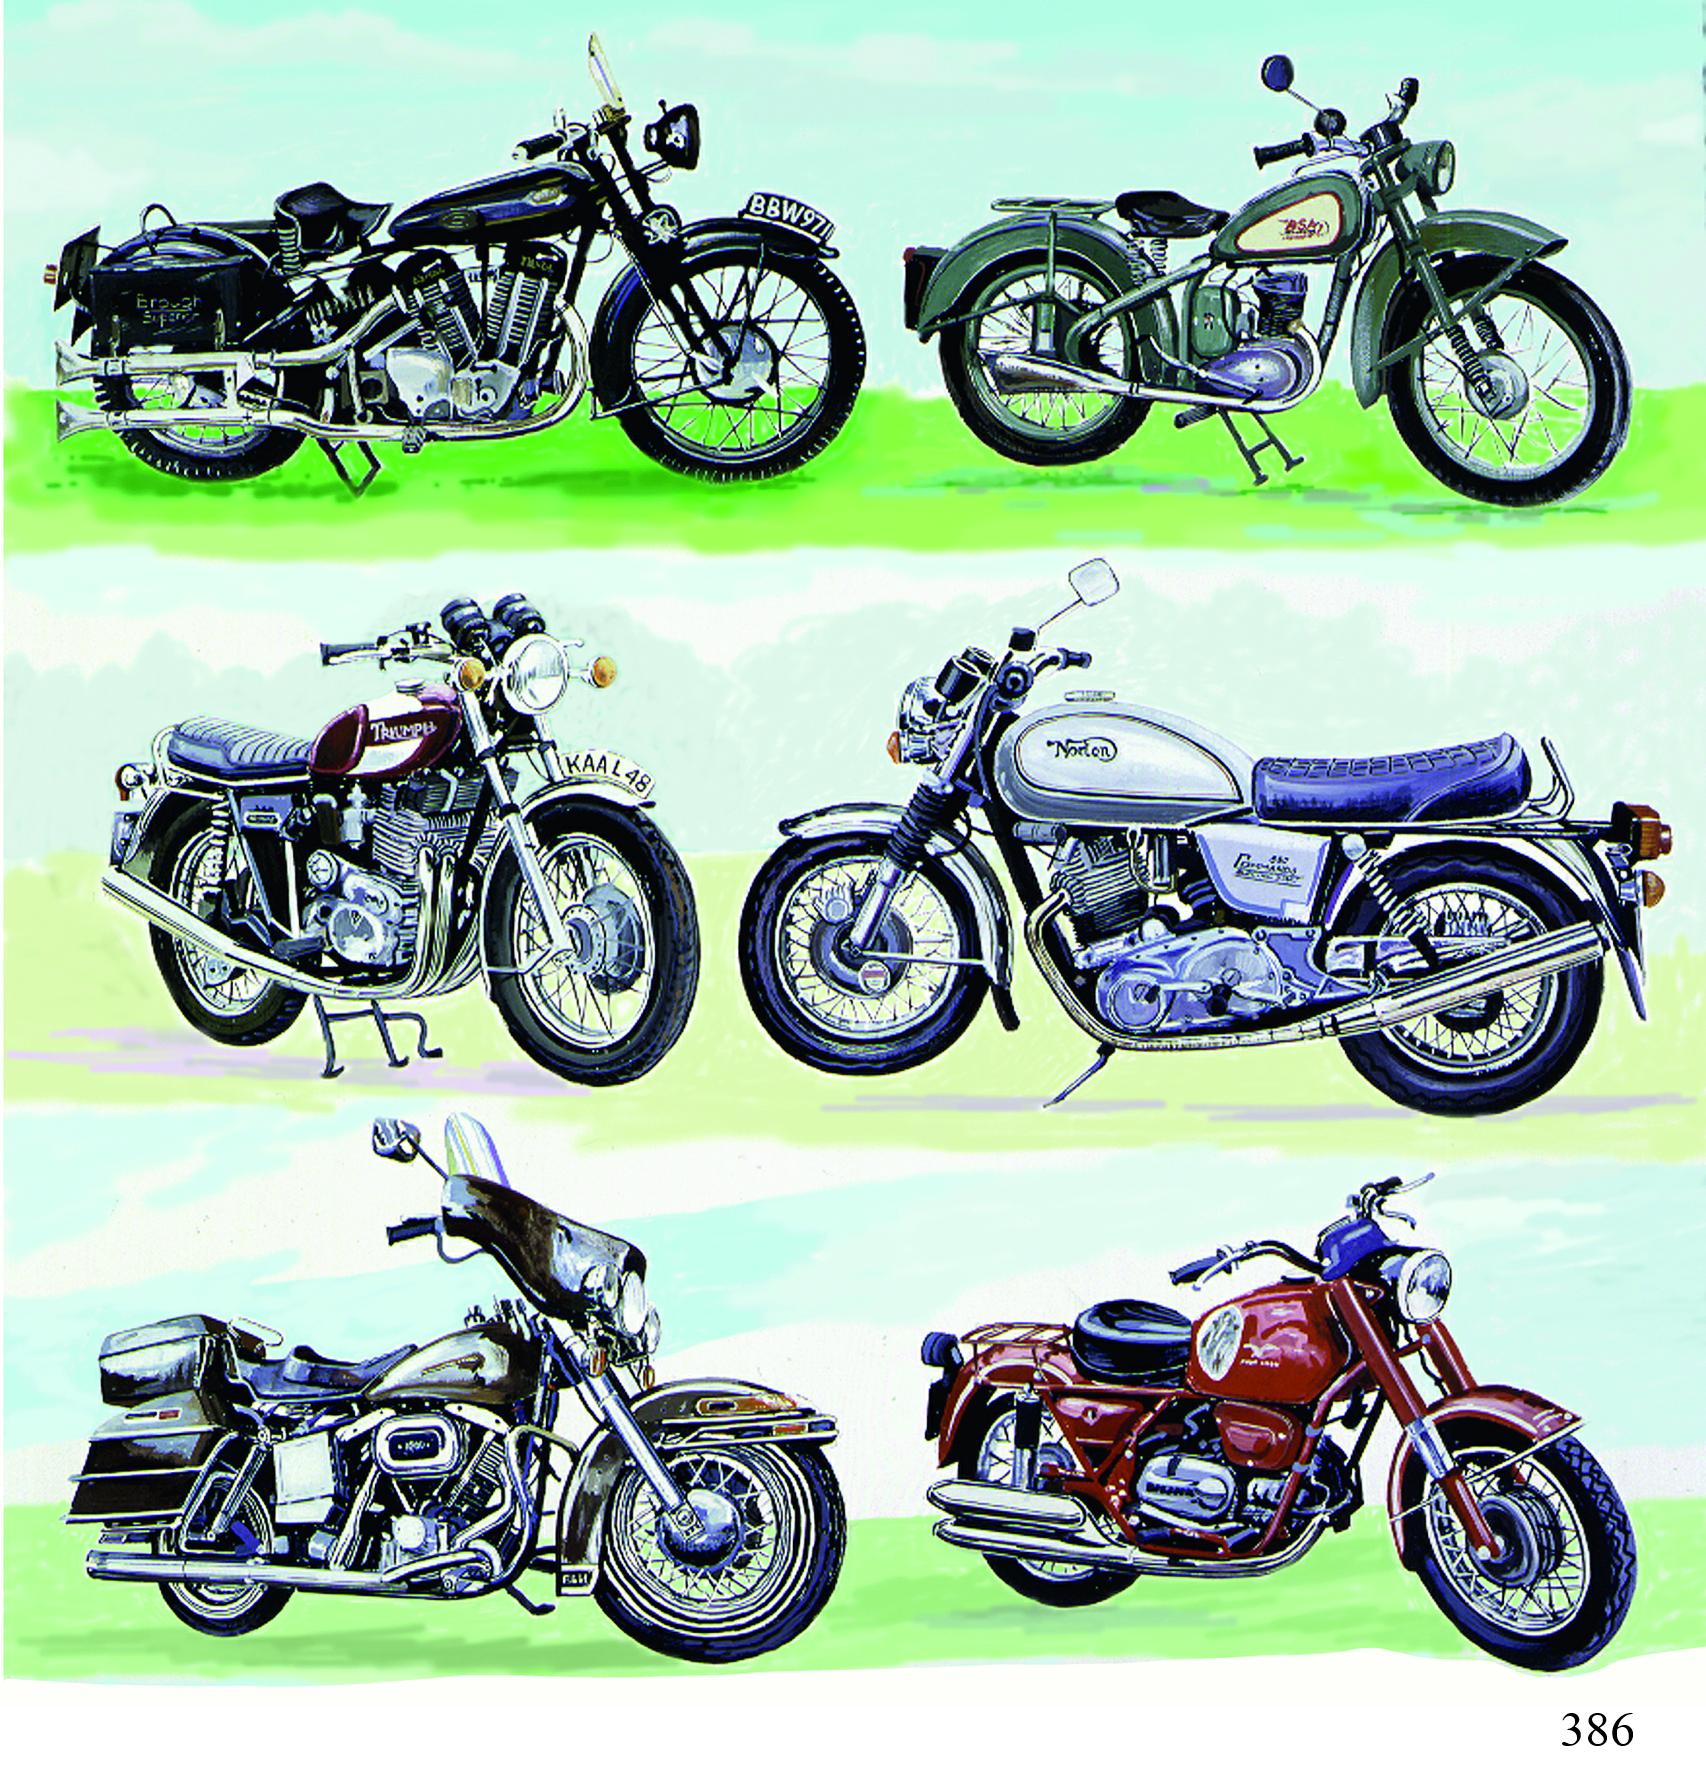 386 motorbikes ArtyCards Oct 18.jpg